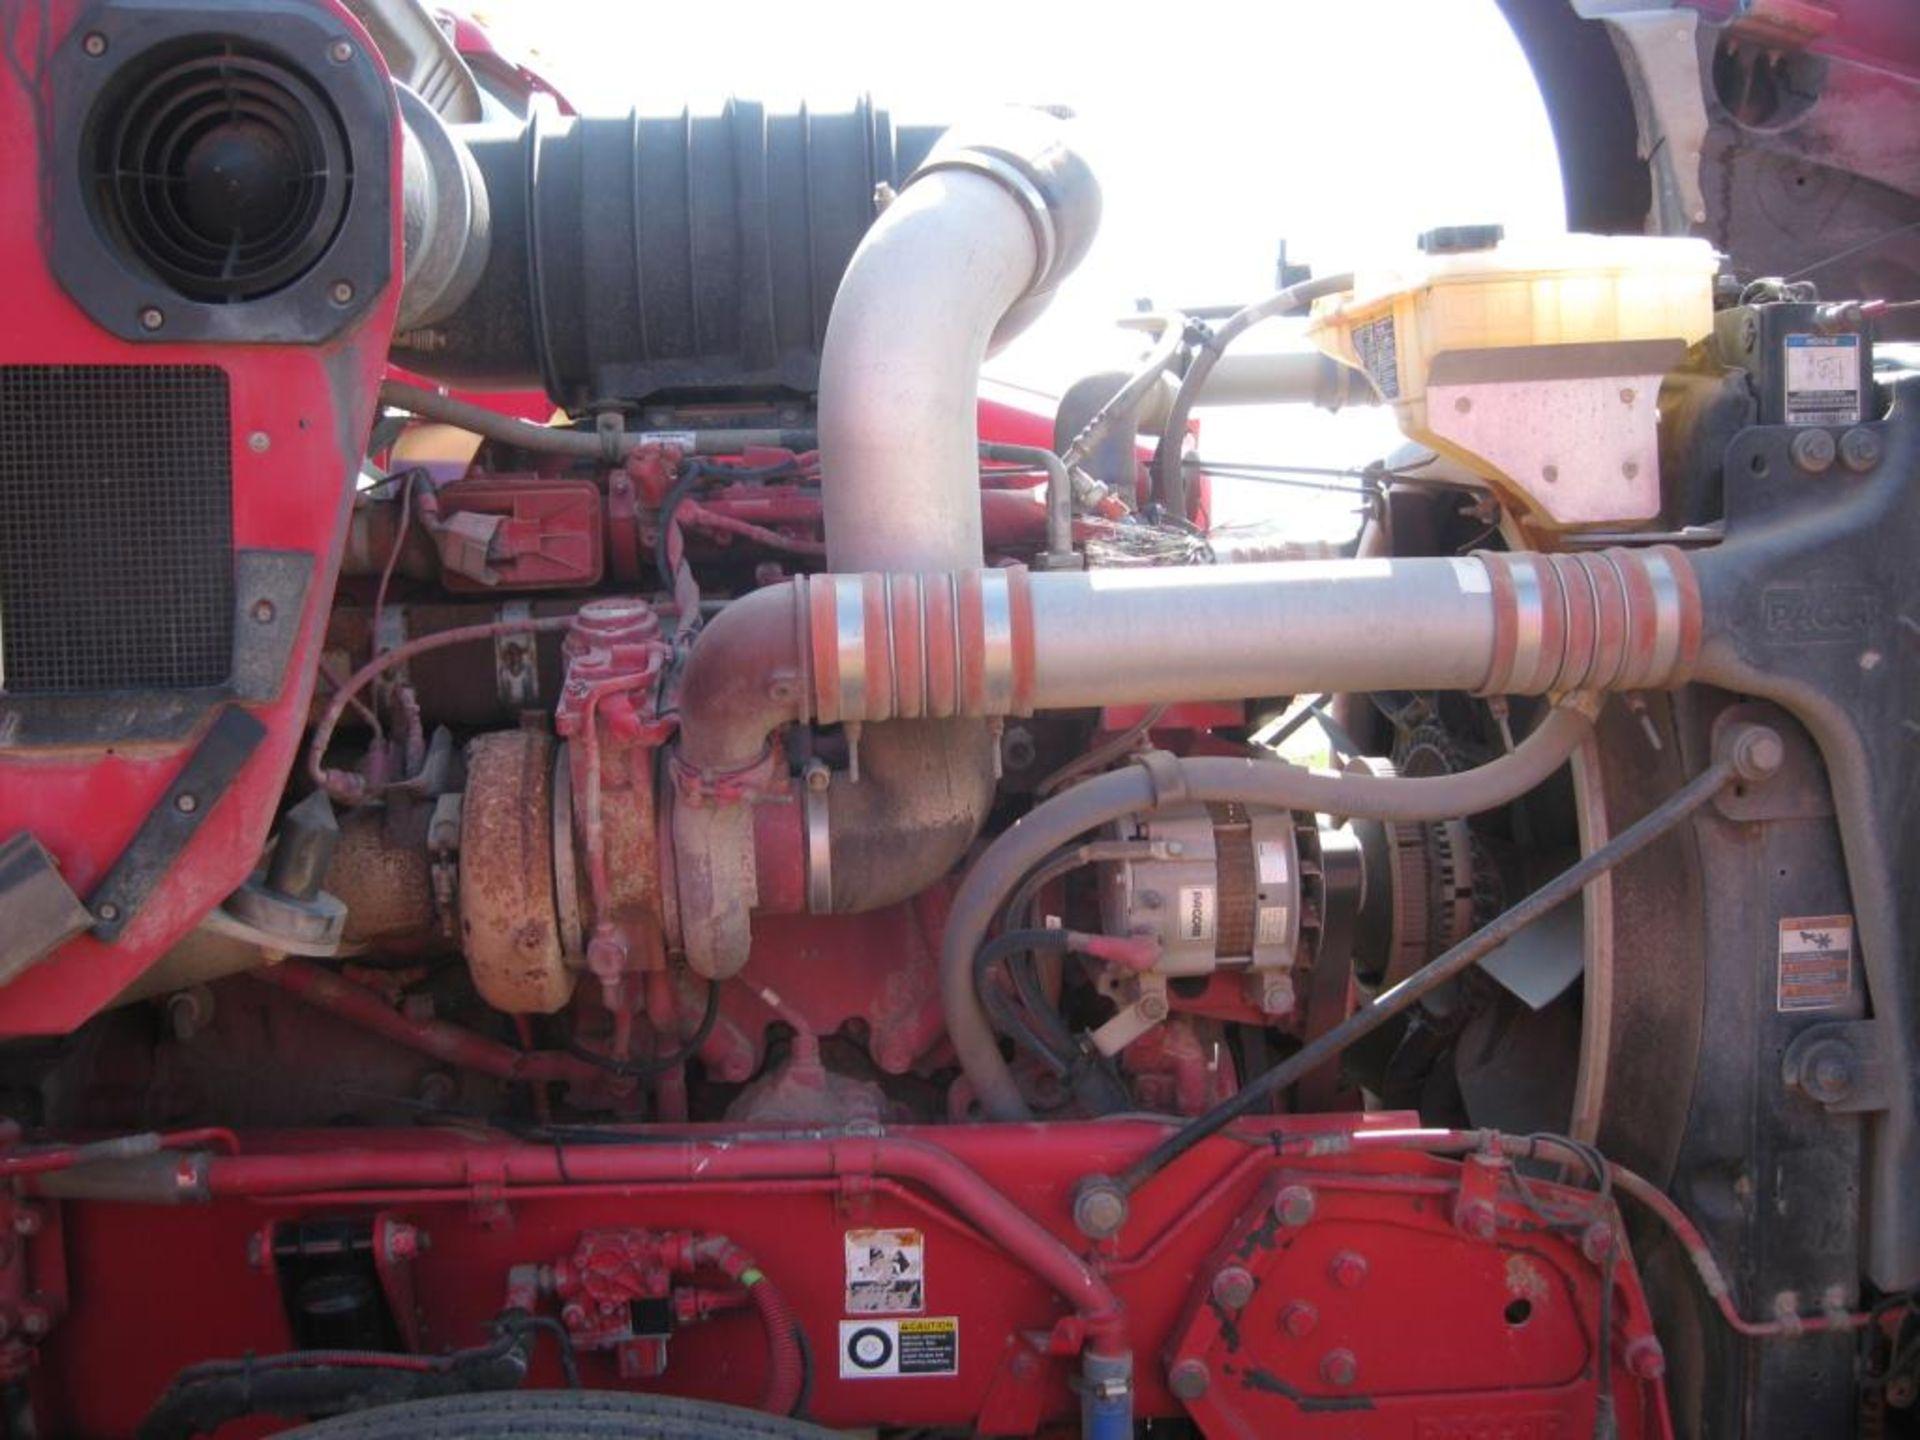 Kenworth Winch Truck - Image 23 of 25